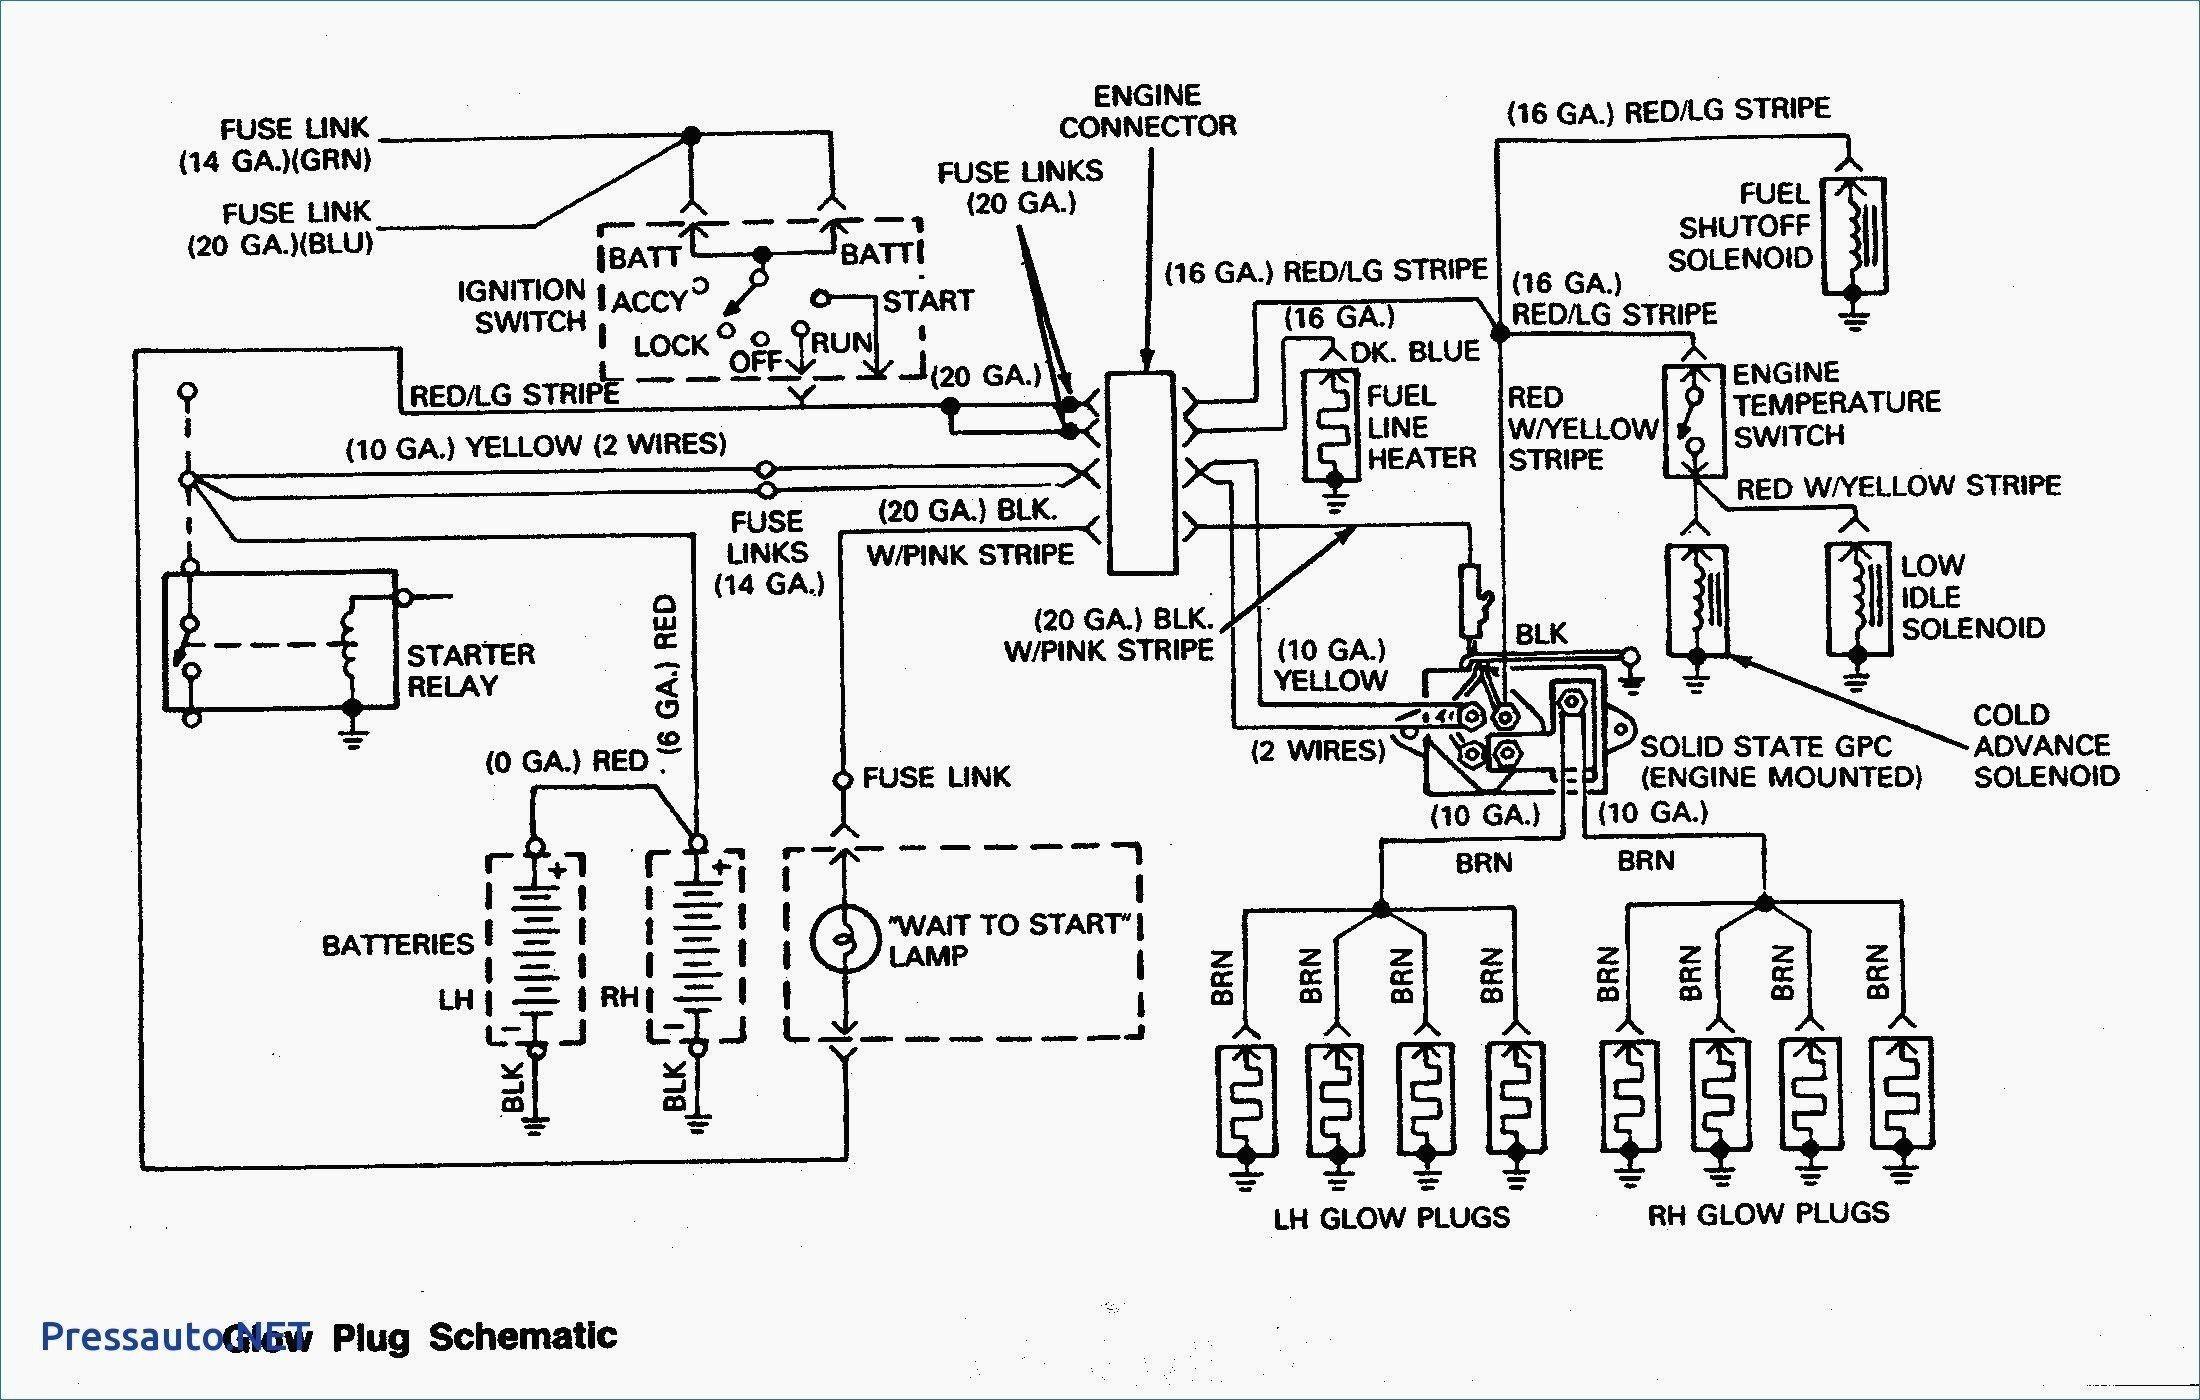 Wiring Diagram Viper 3305v Viper 3305v Wiring Diagram Elegant Of Wiring Diagram Viper 3305v